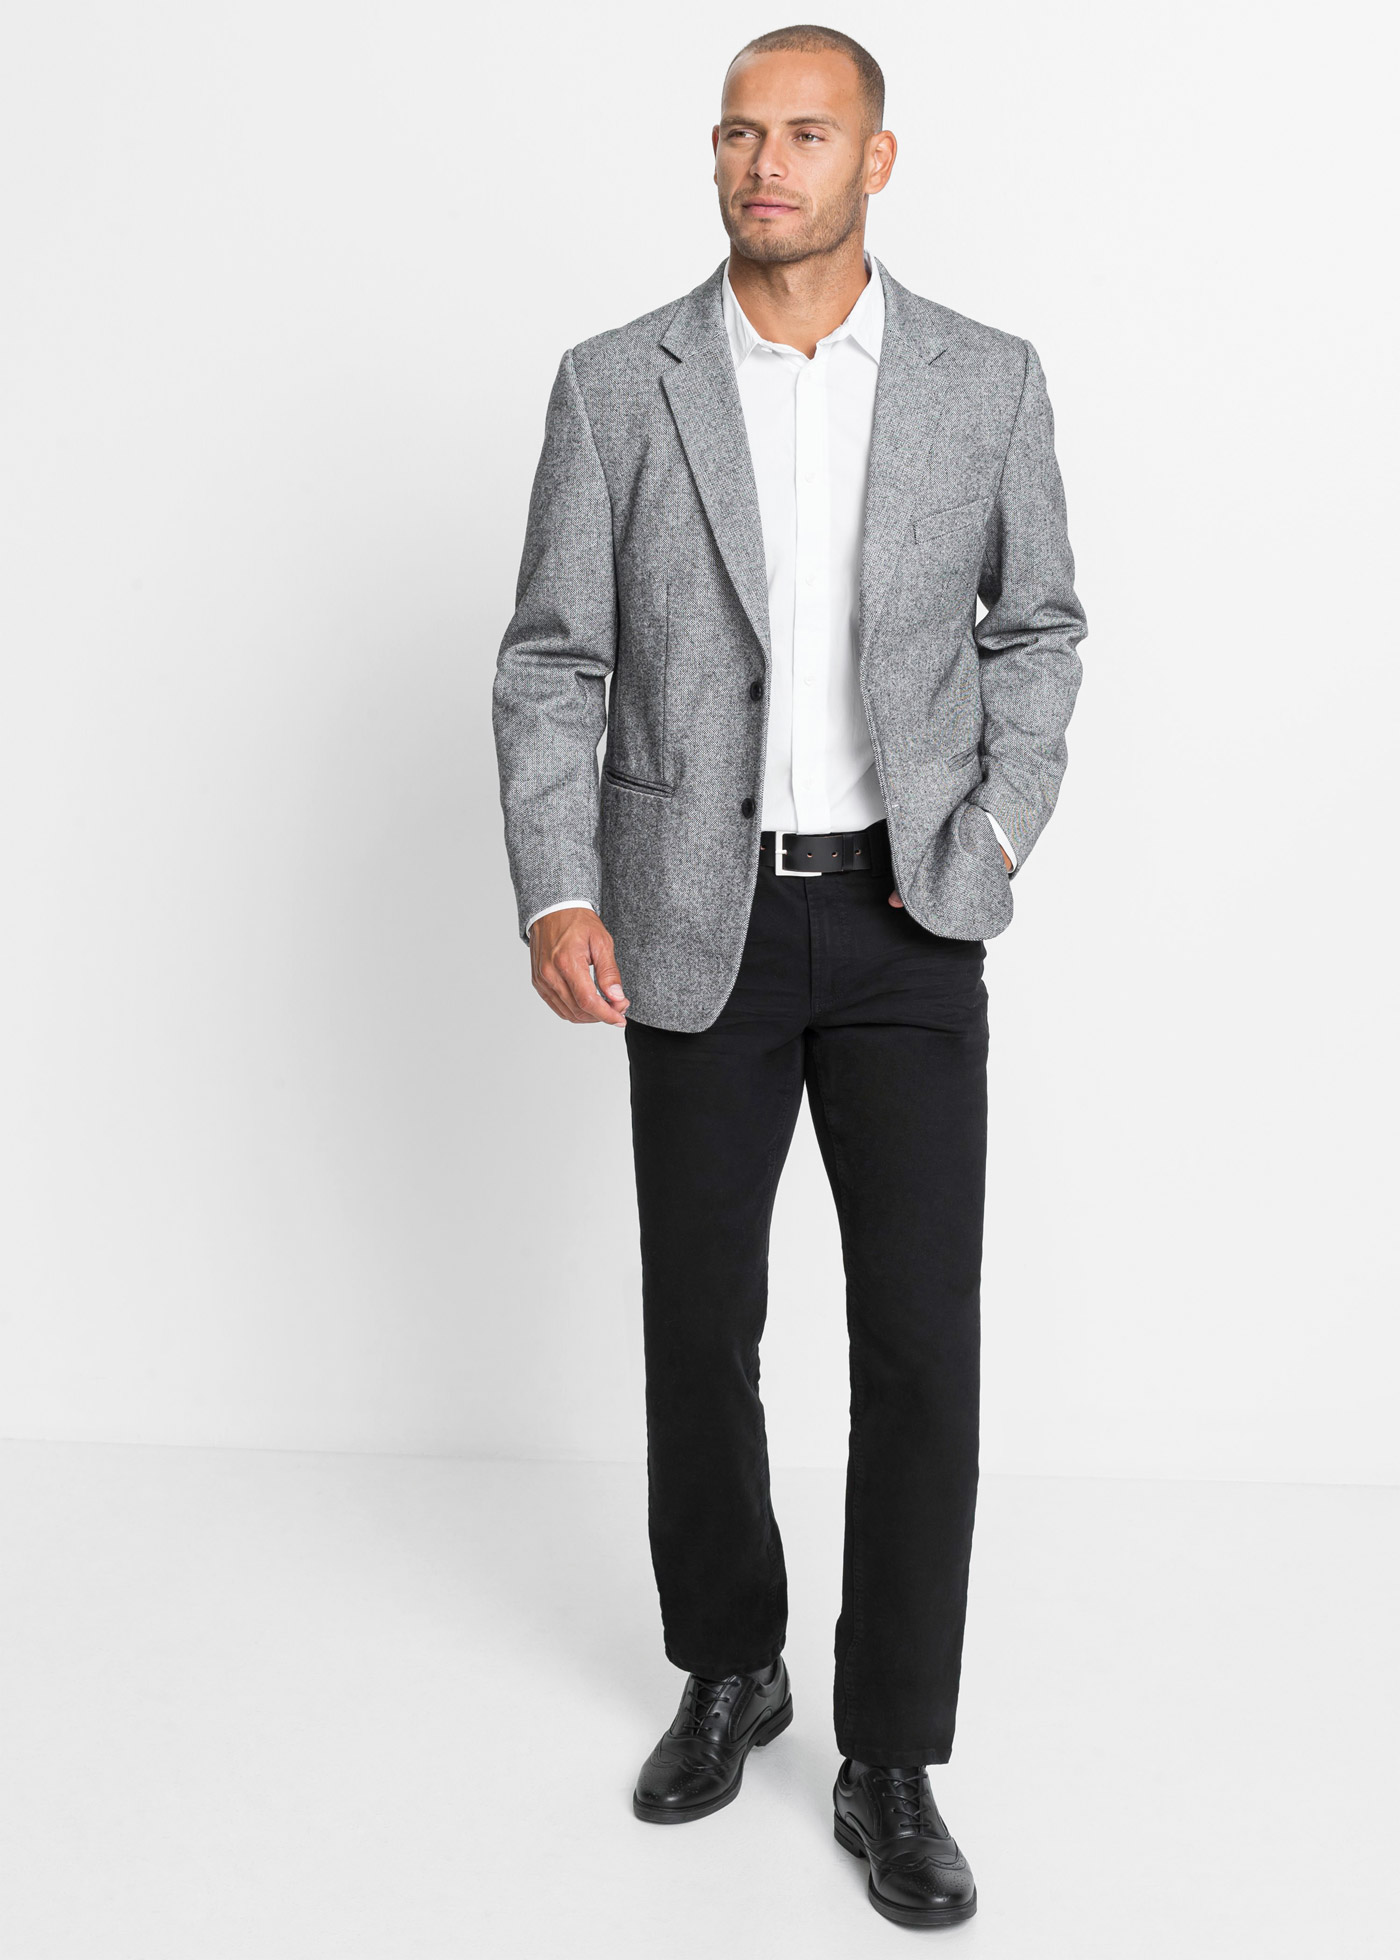 Casual chic outfit voor heren